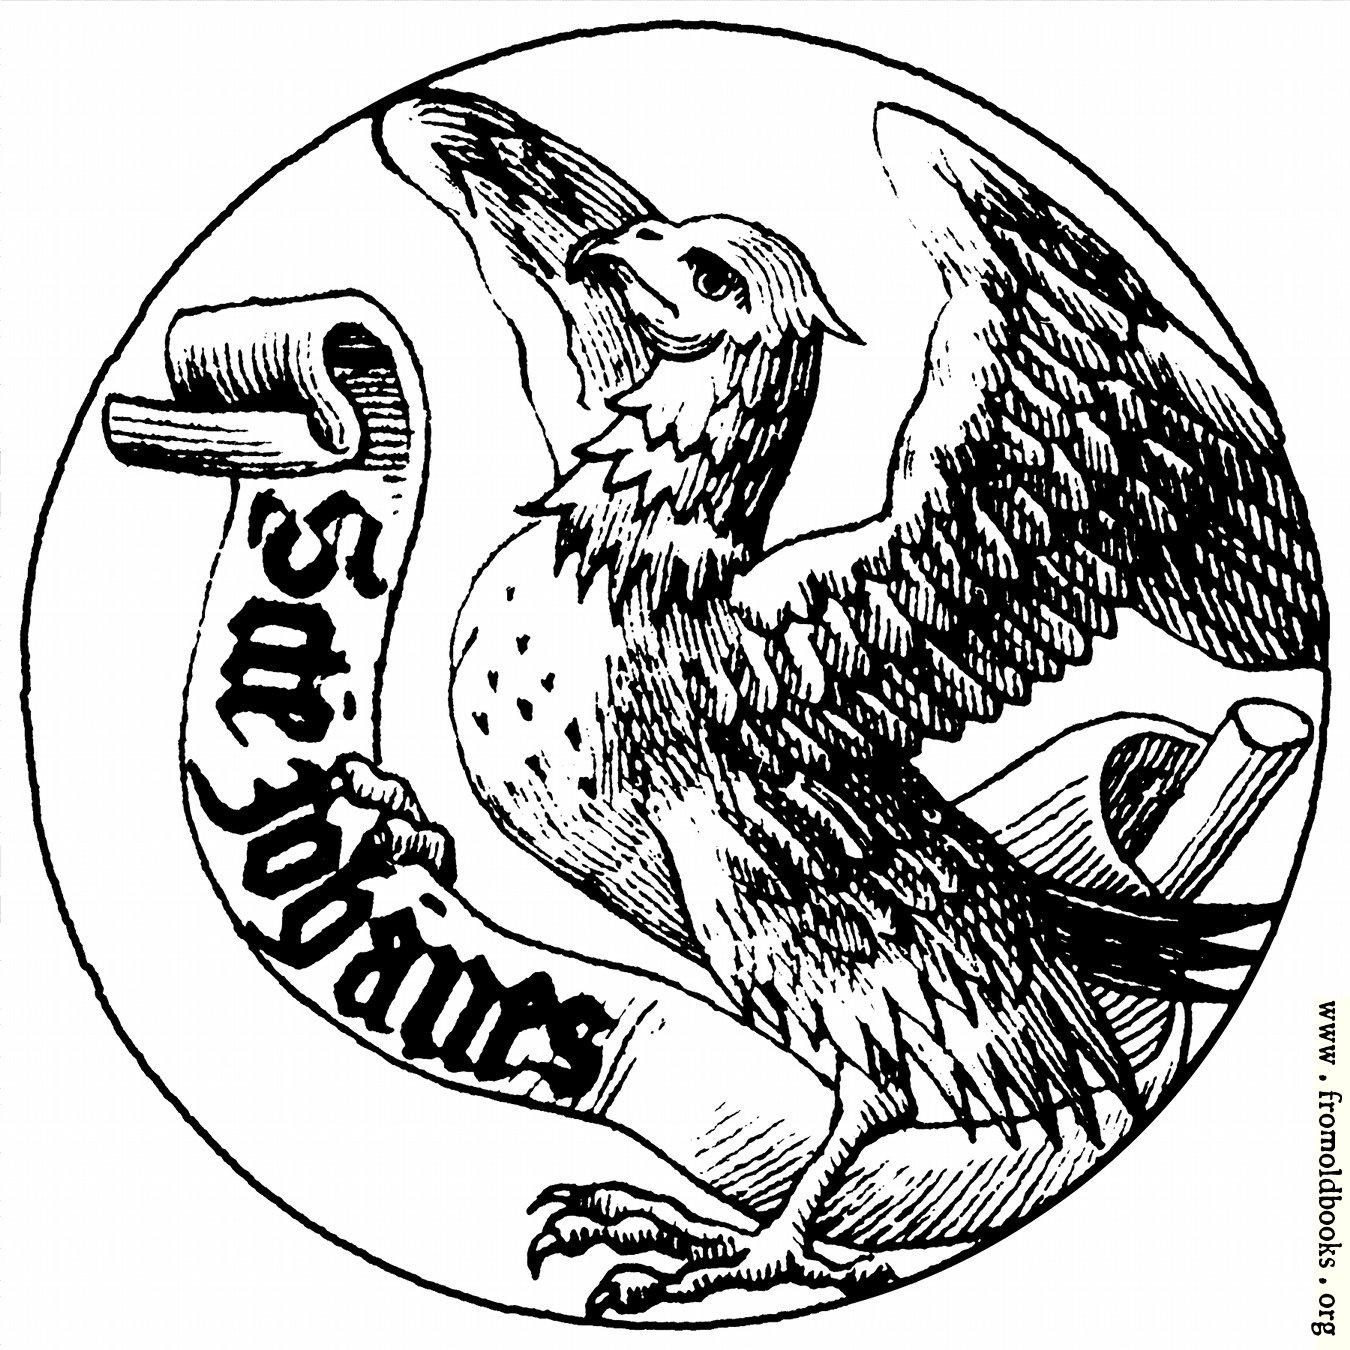 [Picture: Badge of Saint John the Evangelist]